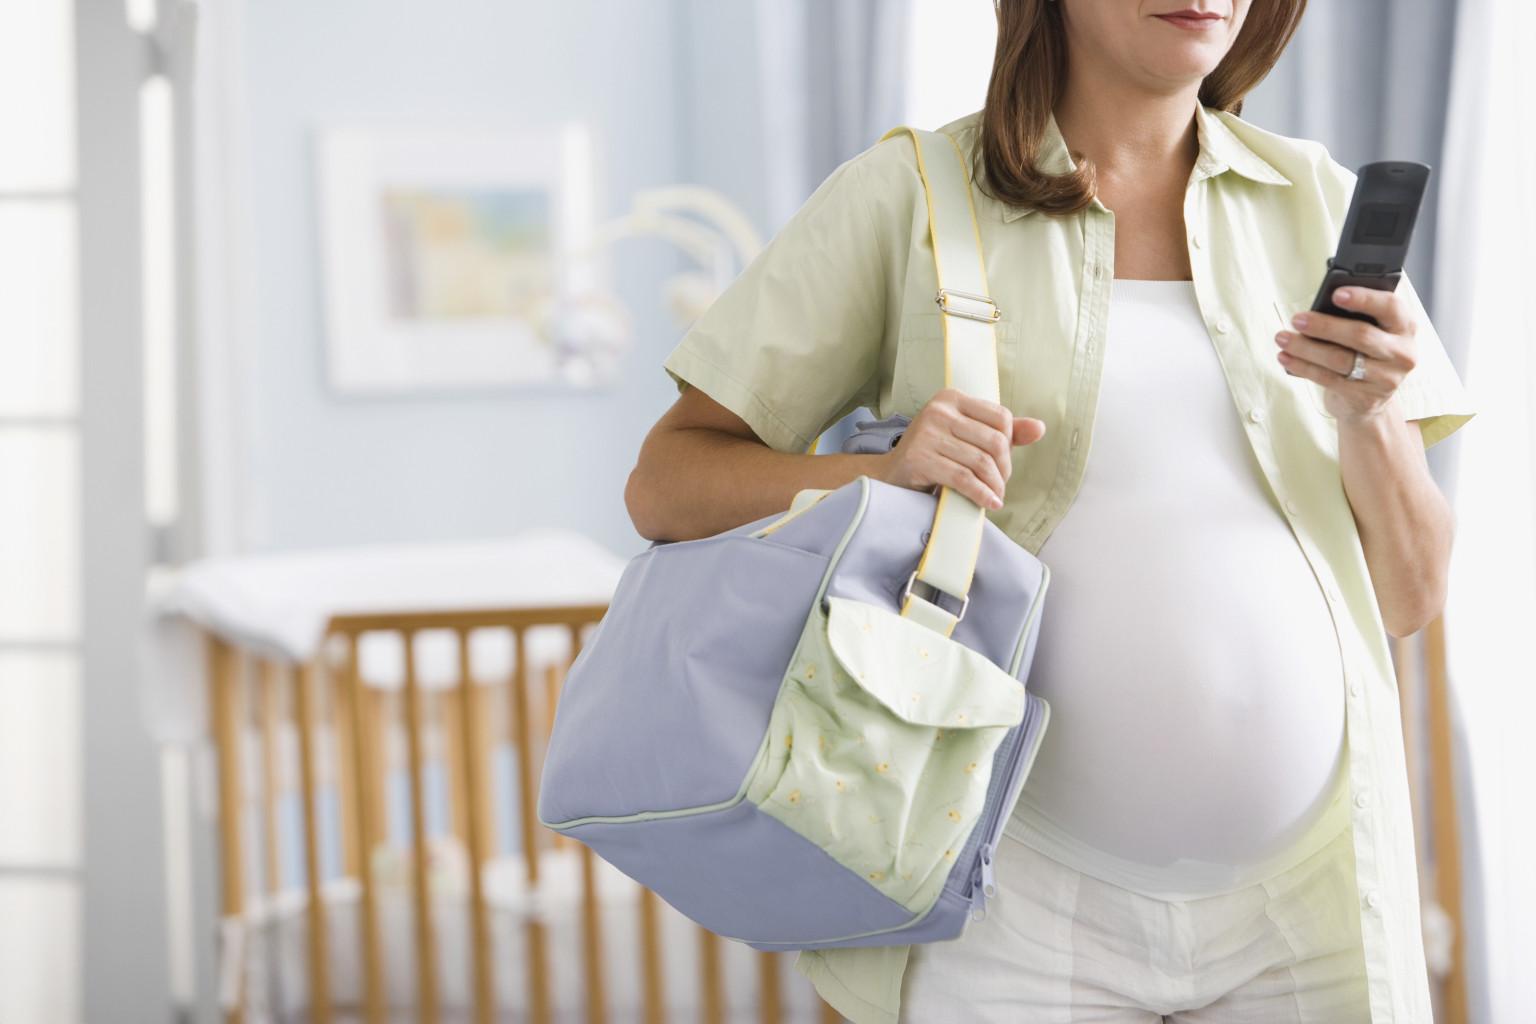 Pregnant Hispanic woman dialing cell phone